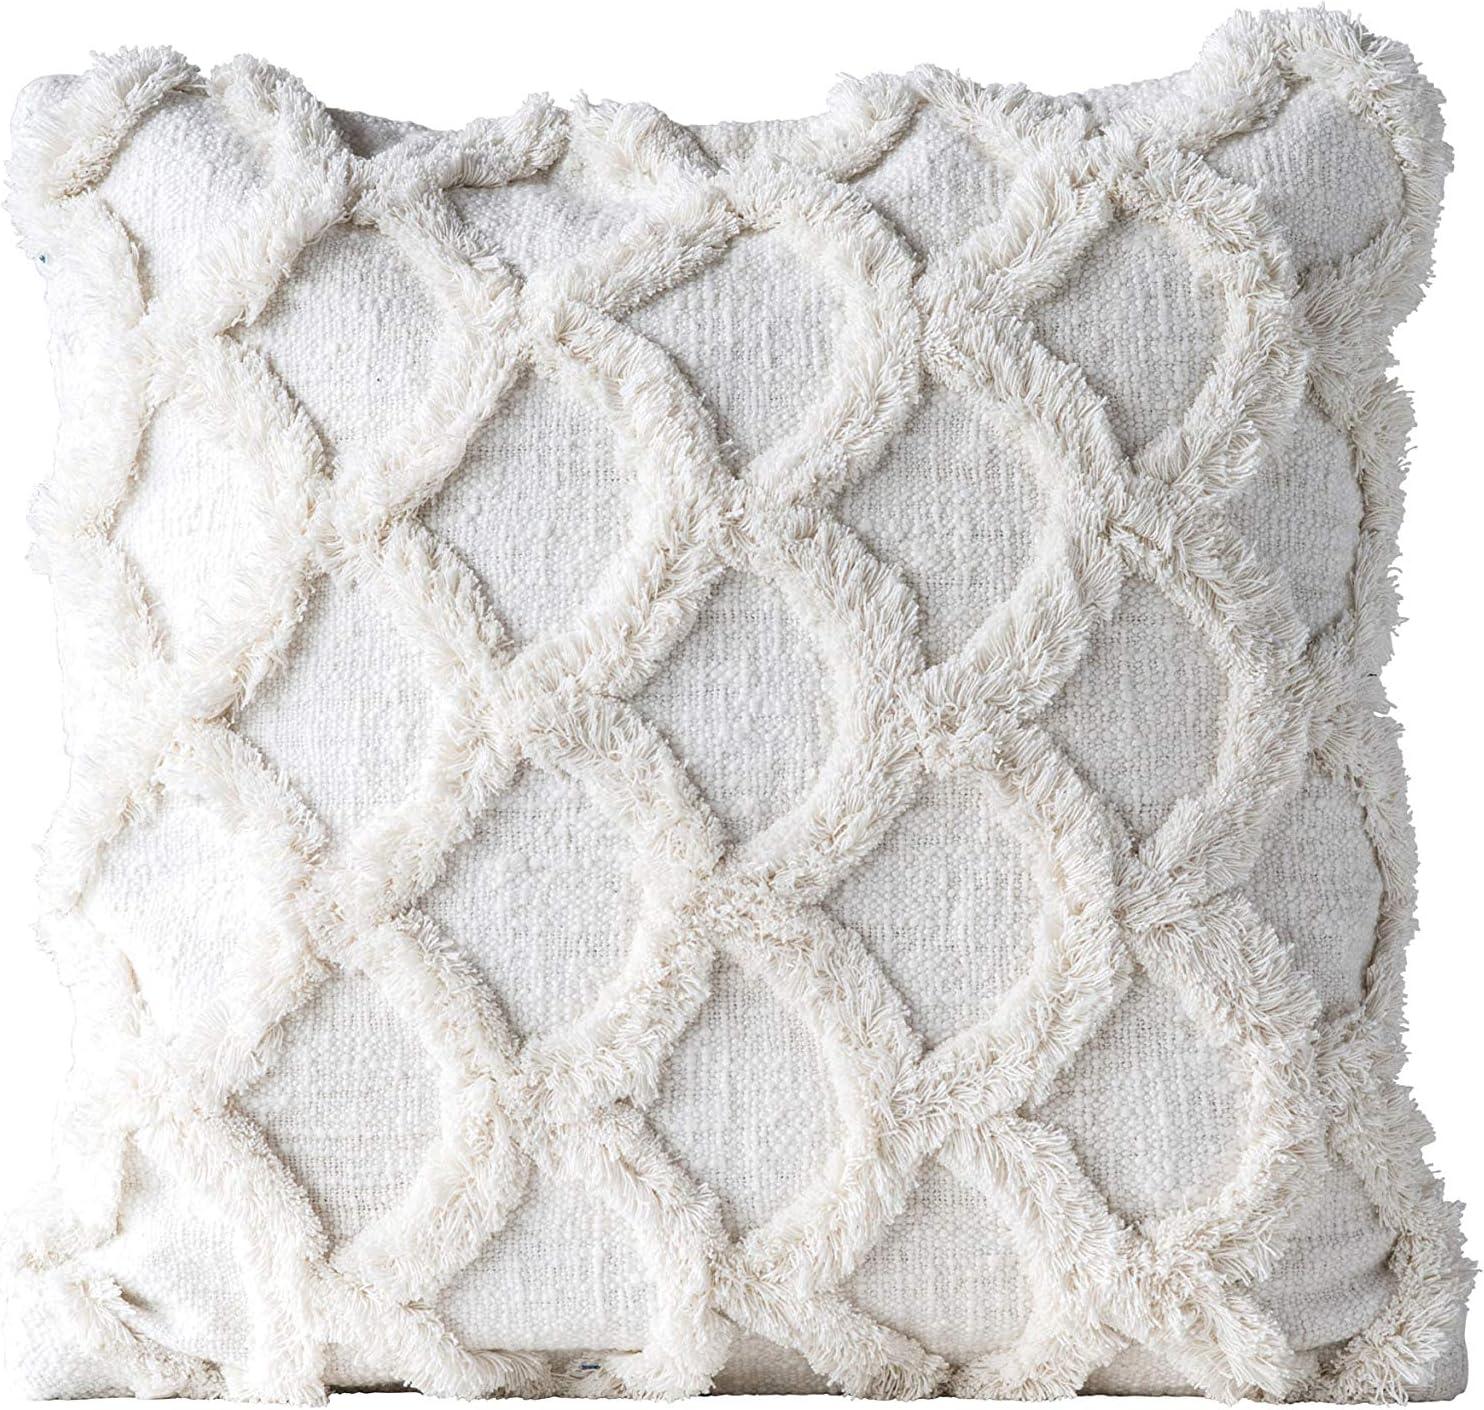 Creative Popular Co-Op Square Cotton White Scalloped Pillow Max 61% OFF Chenille